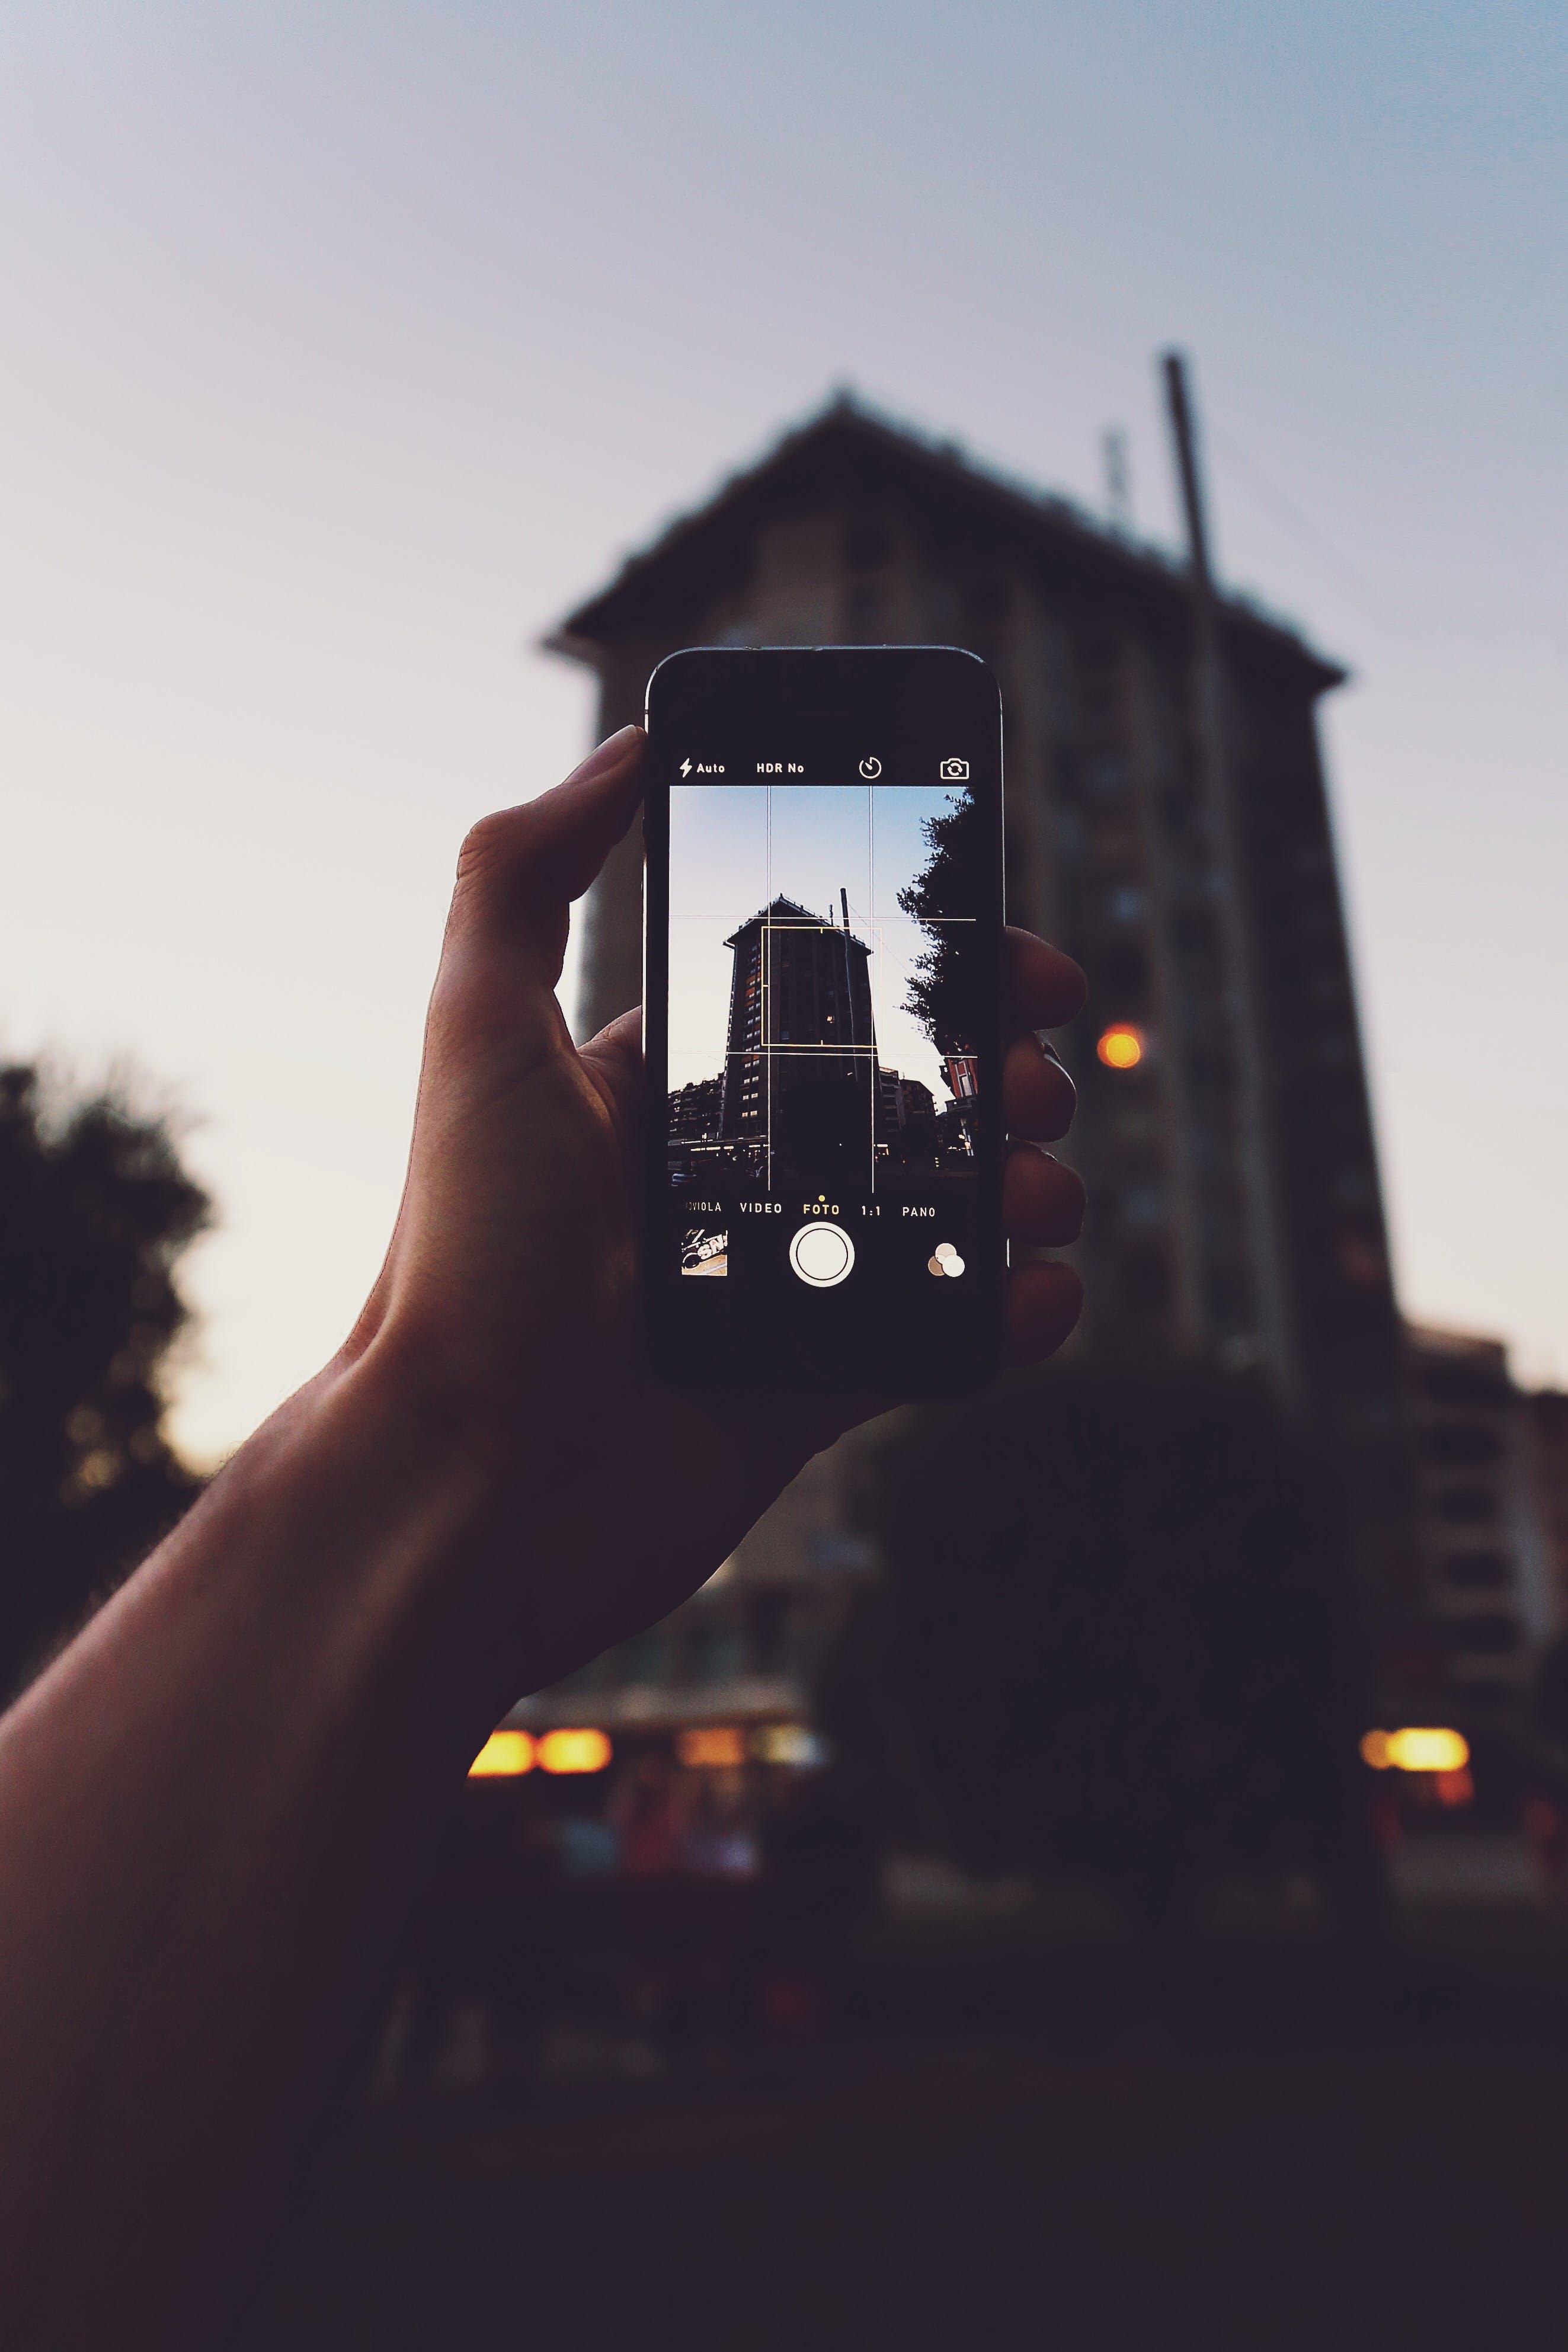 Kostenloses Stock Foto zu sonnenuntergang, person, hand, beleuchtung